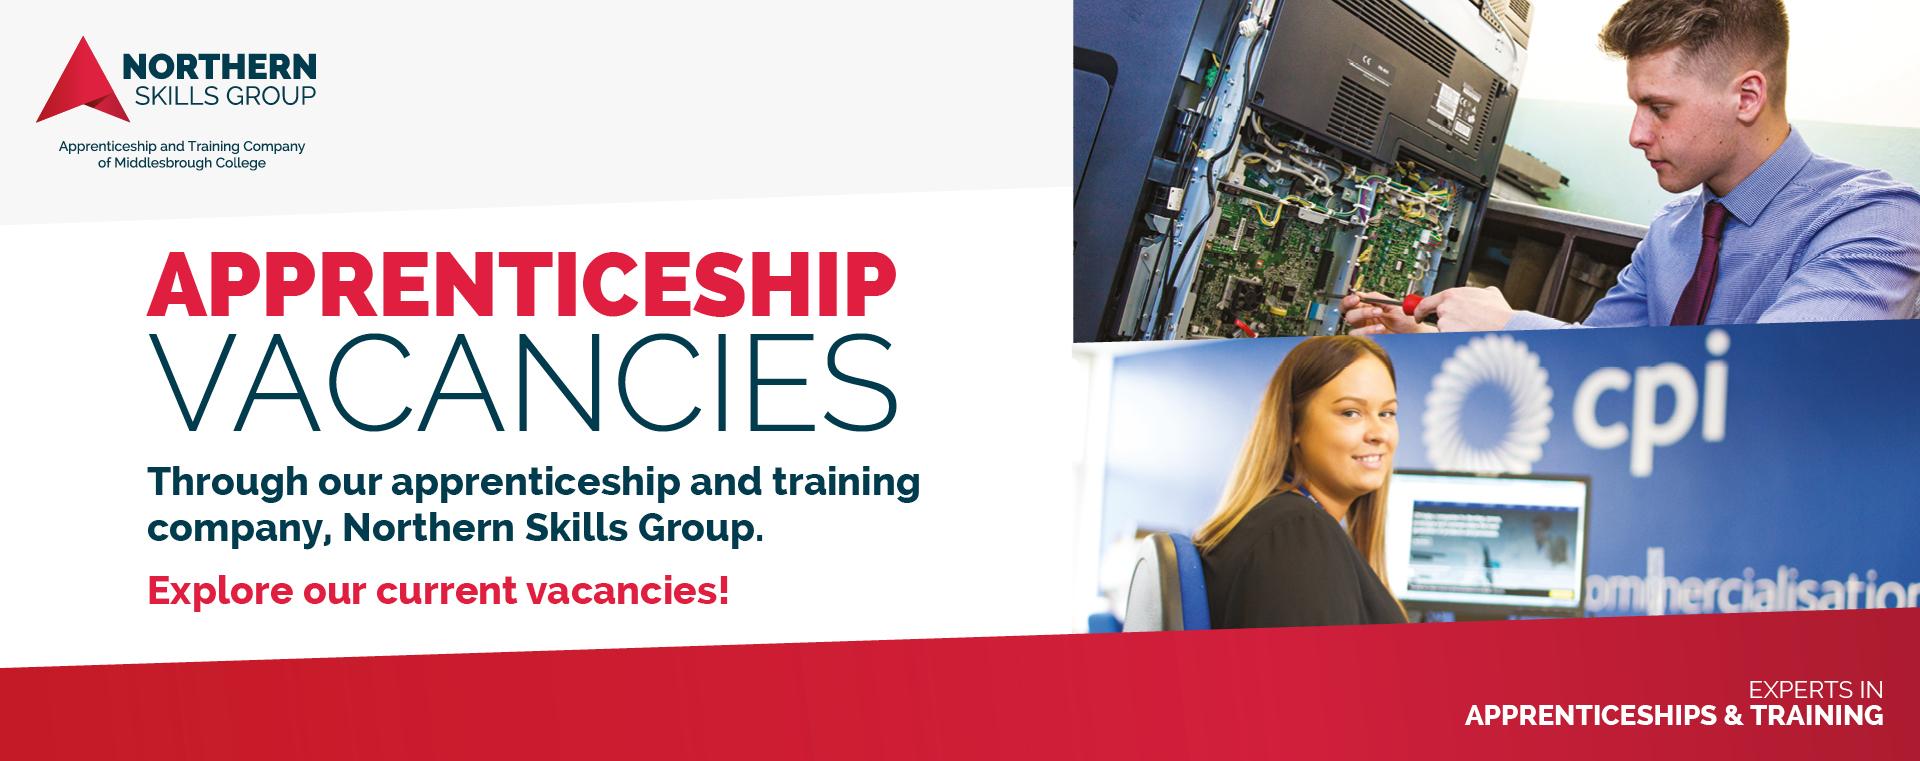 Northern Skills Group Apprenticeship Vacancies